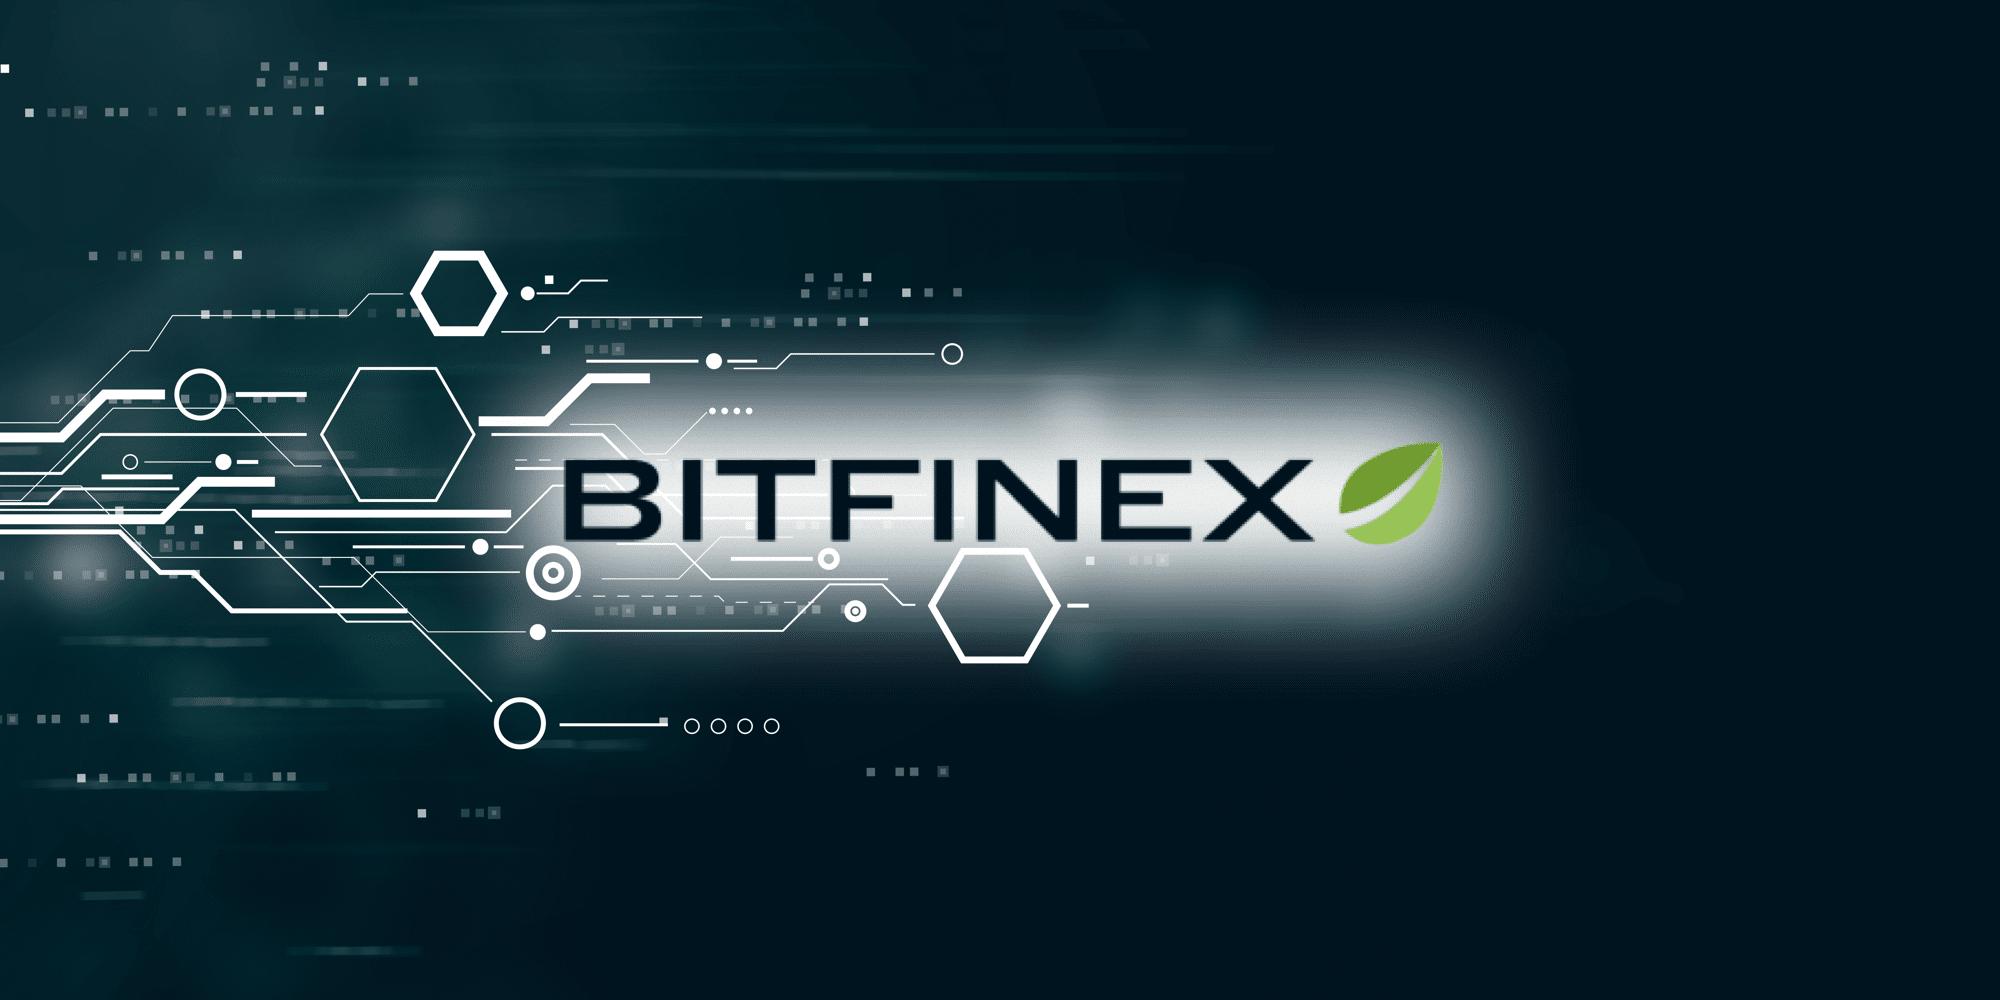 Bitfinex Introduces 'New, Improved' Fiat Deposit System Following Last Week's Suspension